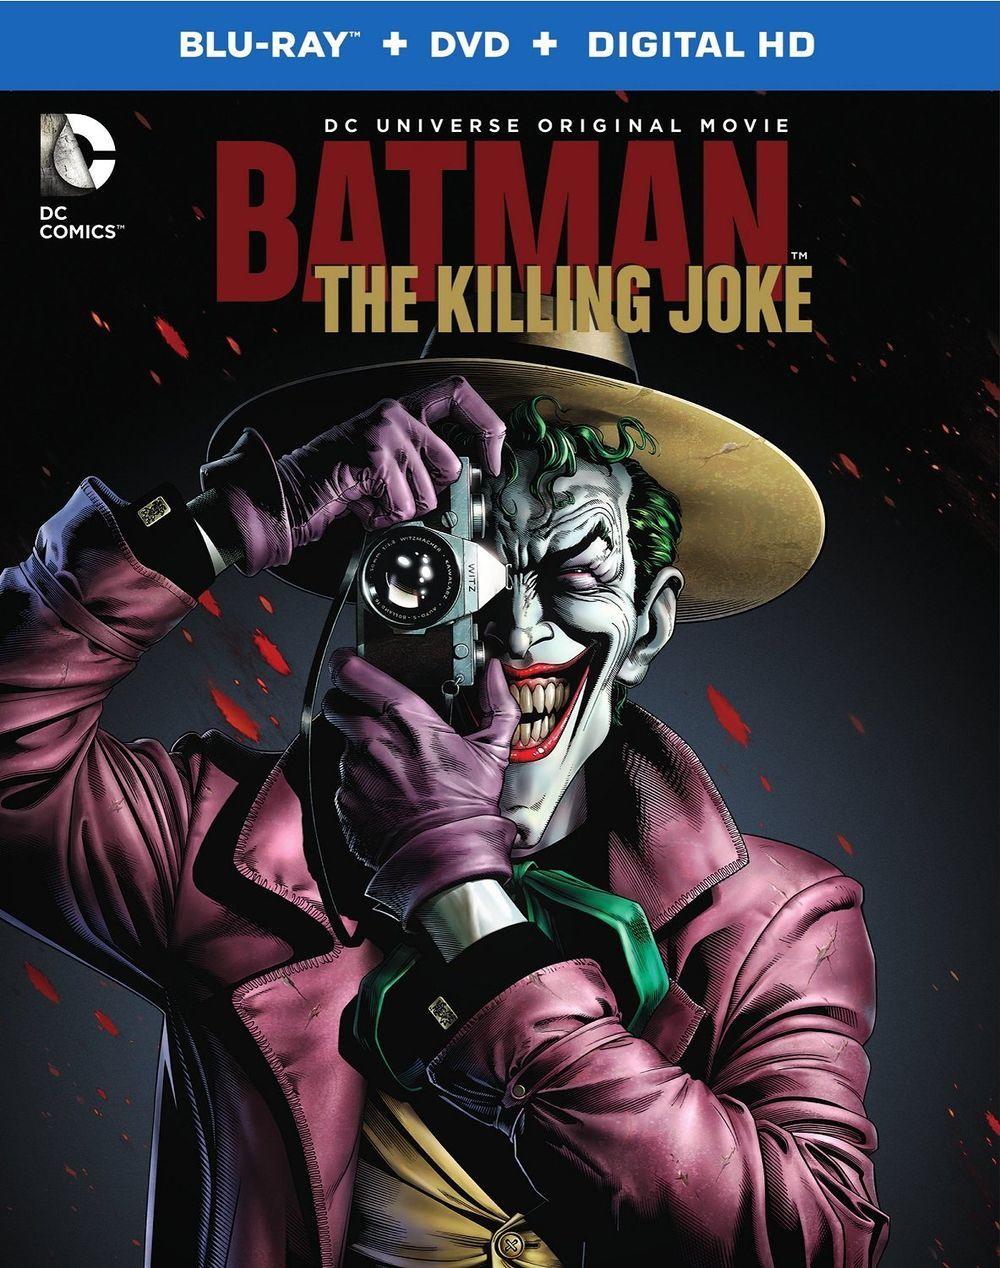 'Batman TheKillingJoke' release date and official cover